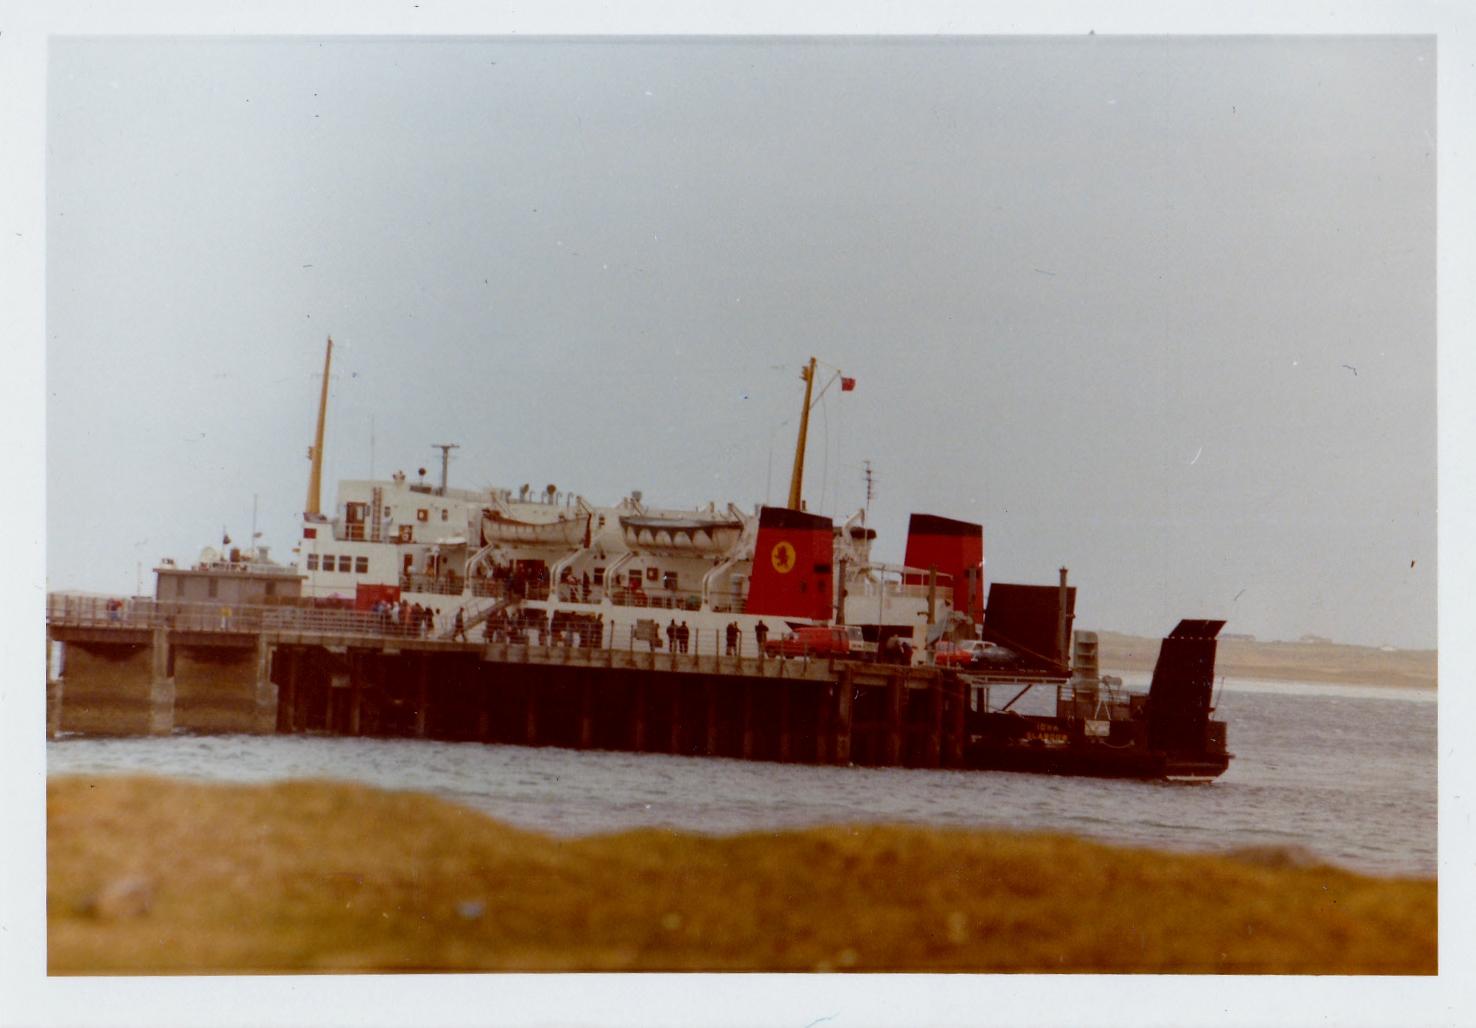 Iona at Tiree (Jim Aikman Smith)